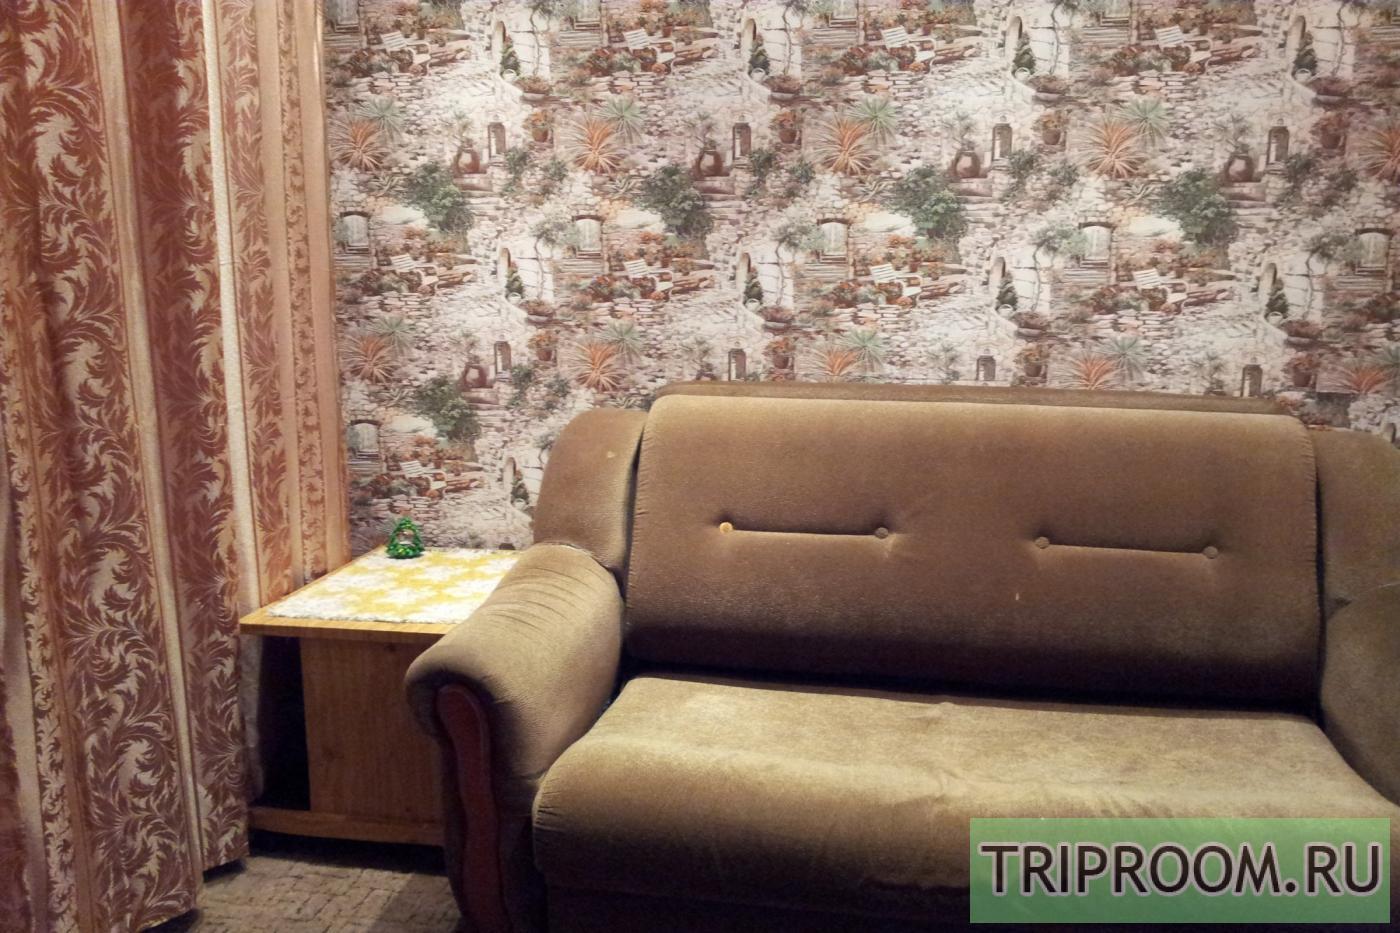 1-комнатная квартира посуточно (вариант № 30855), ул. Кузнецова улица, фото № 1